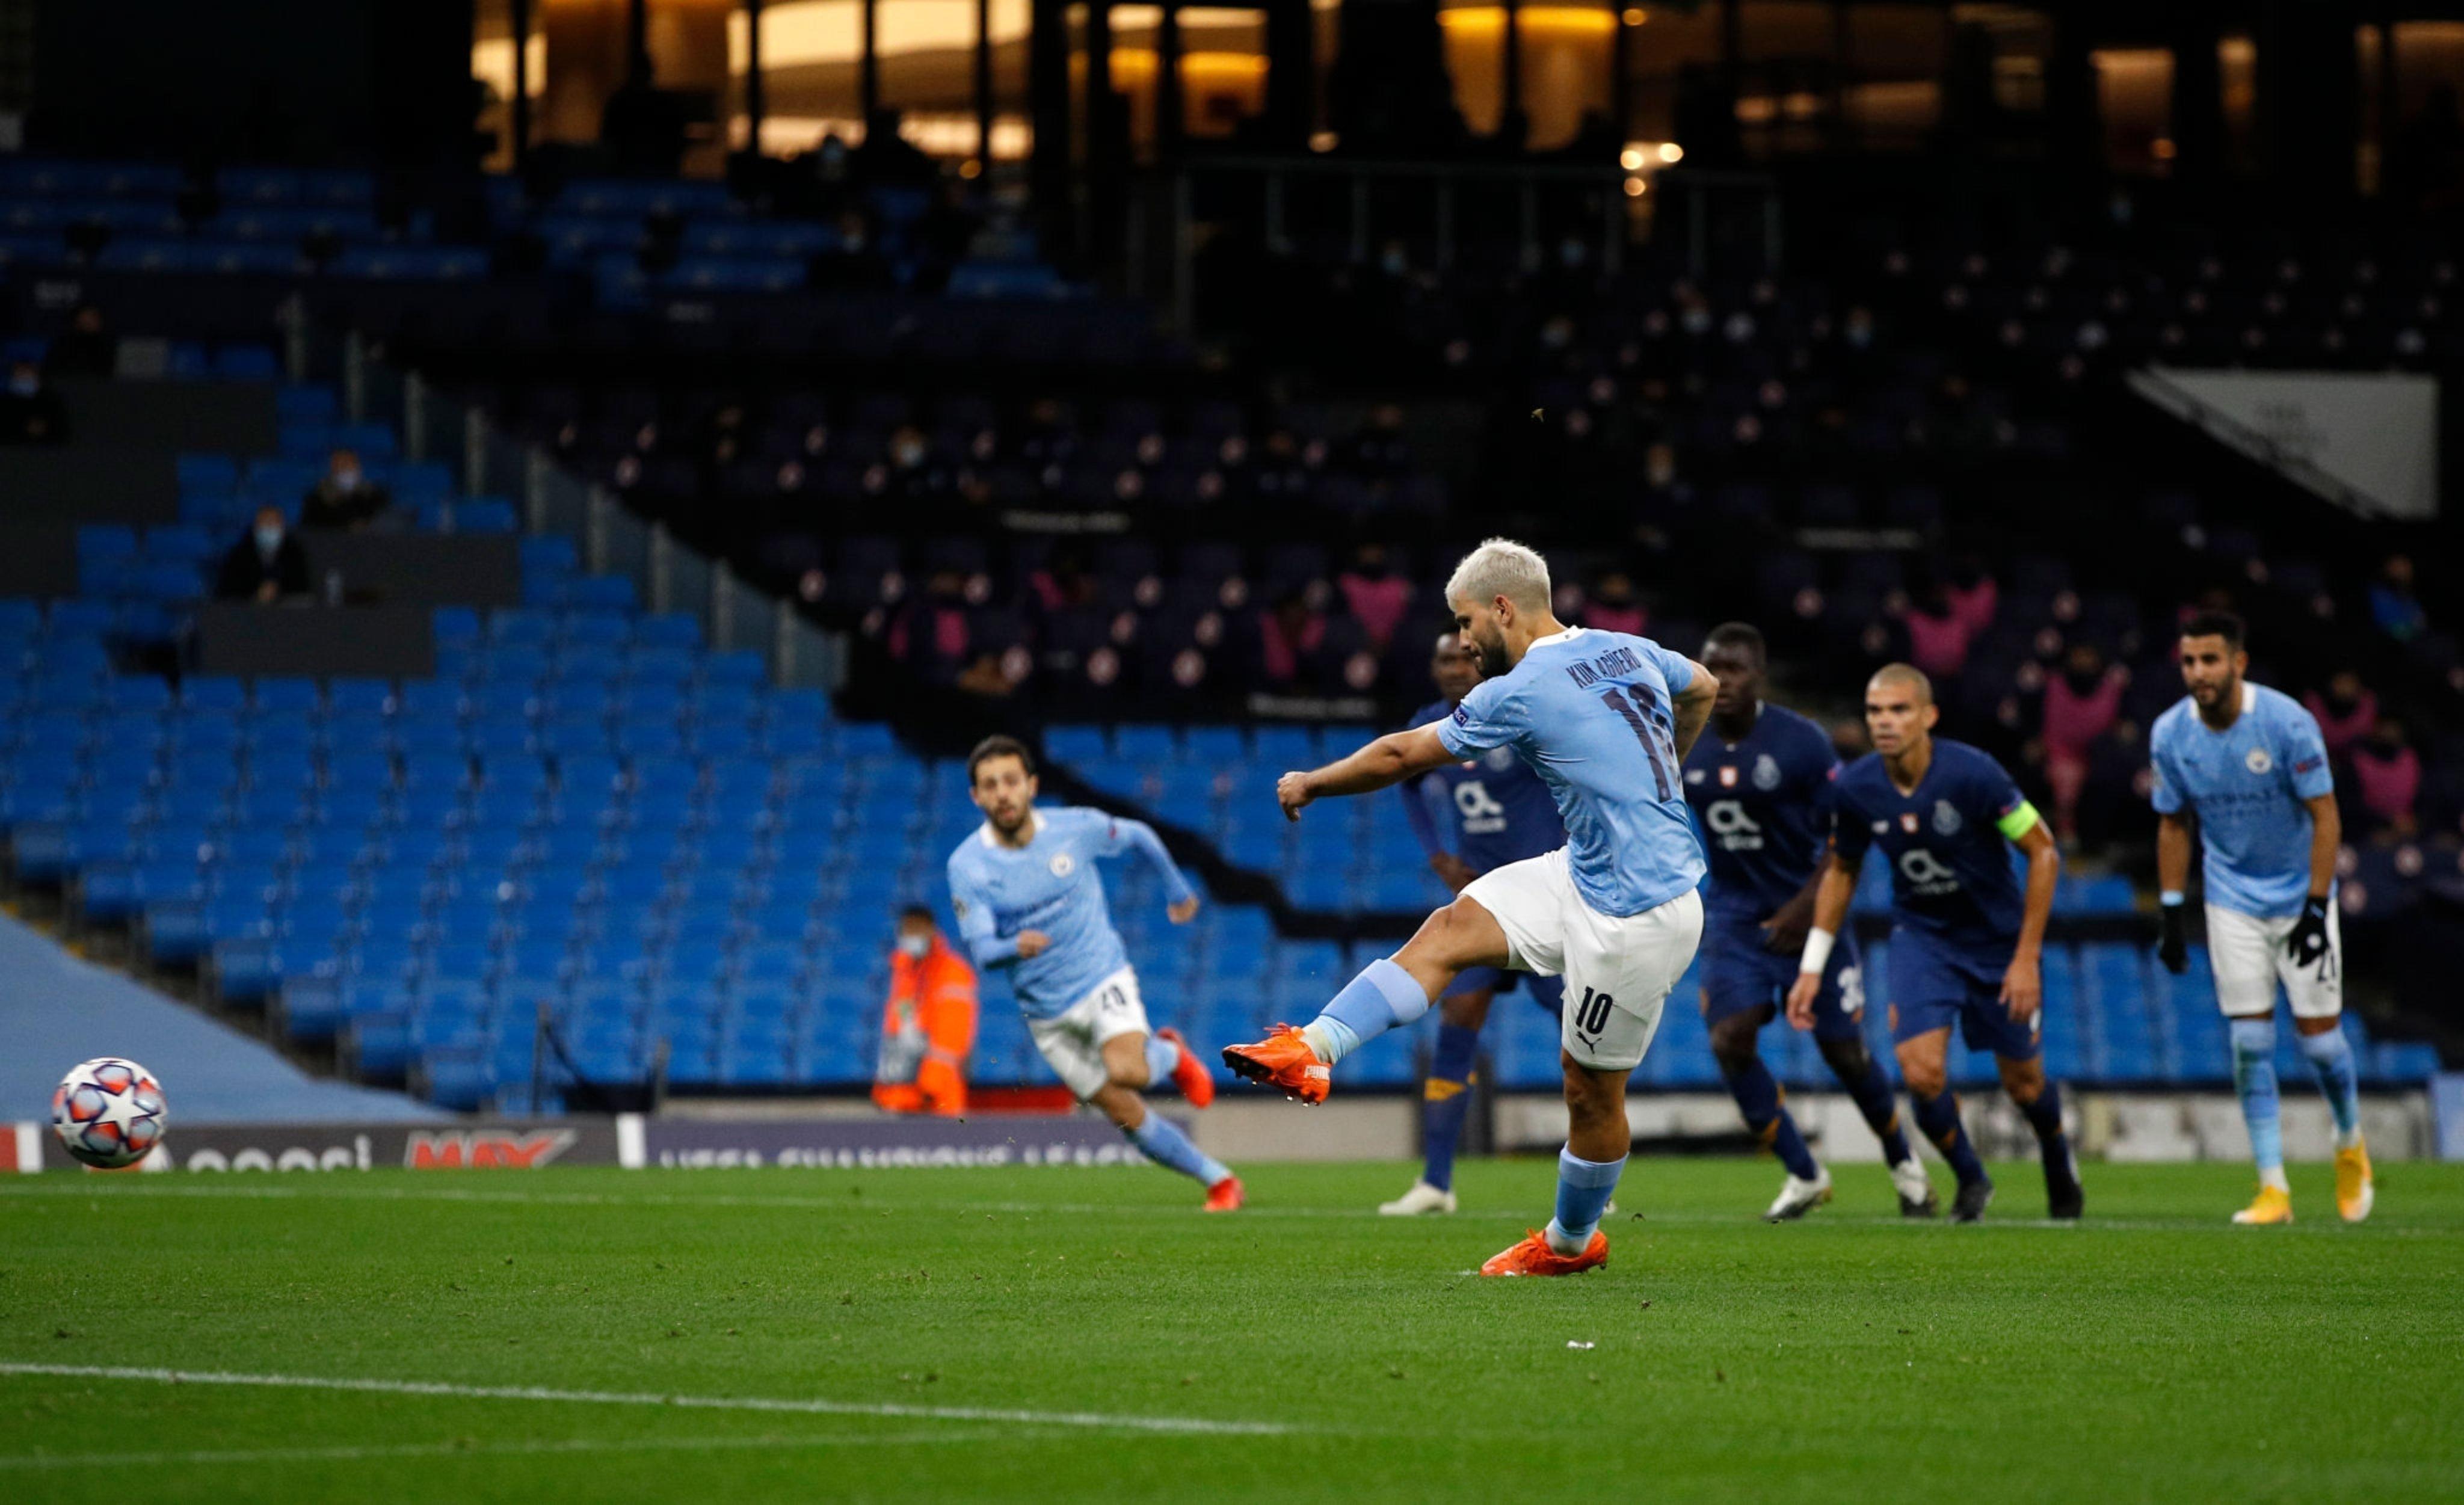 Манчестер Сити - Порту 3:1. На классе, но с потерями - изображение 2